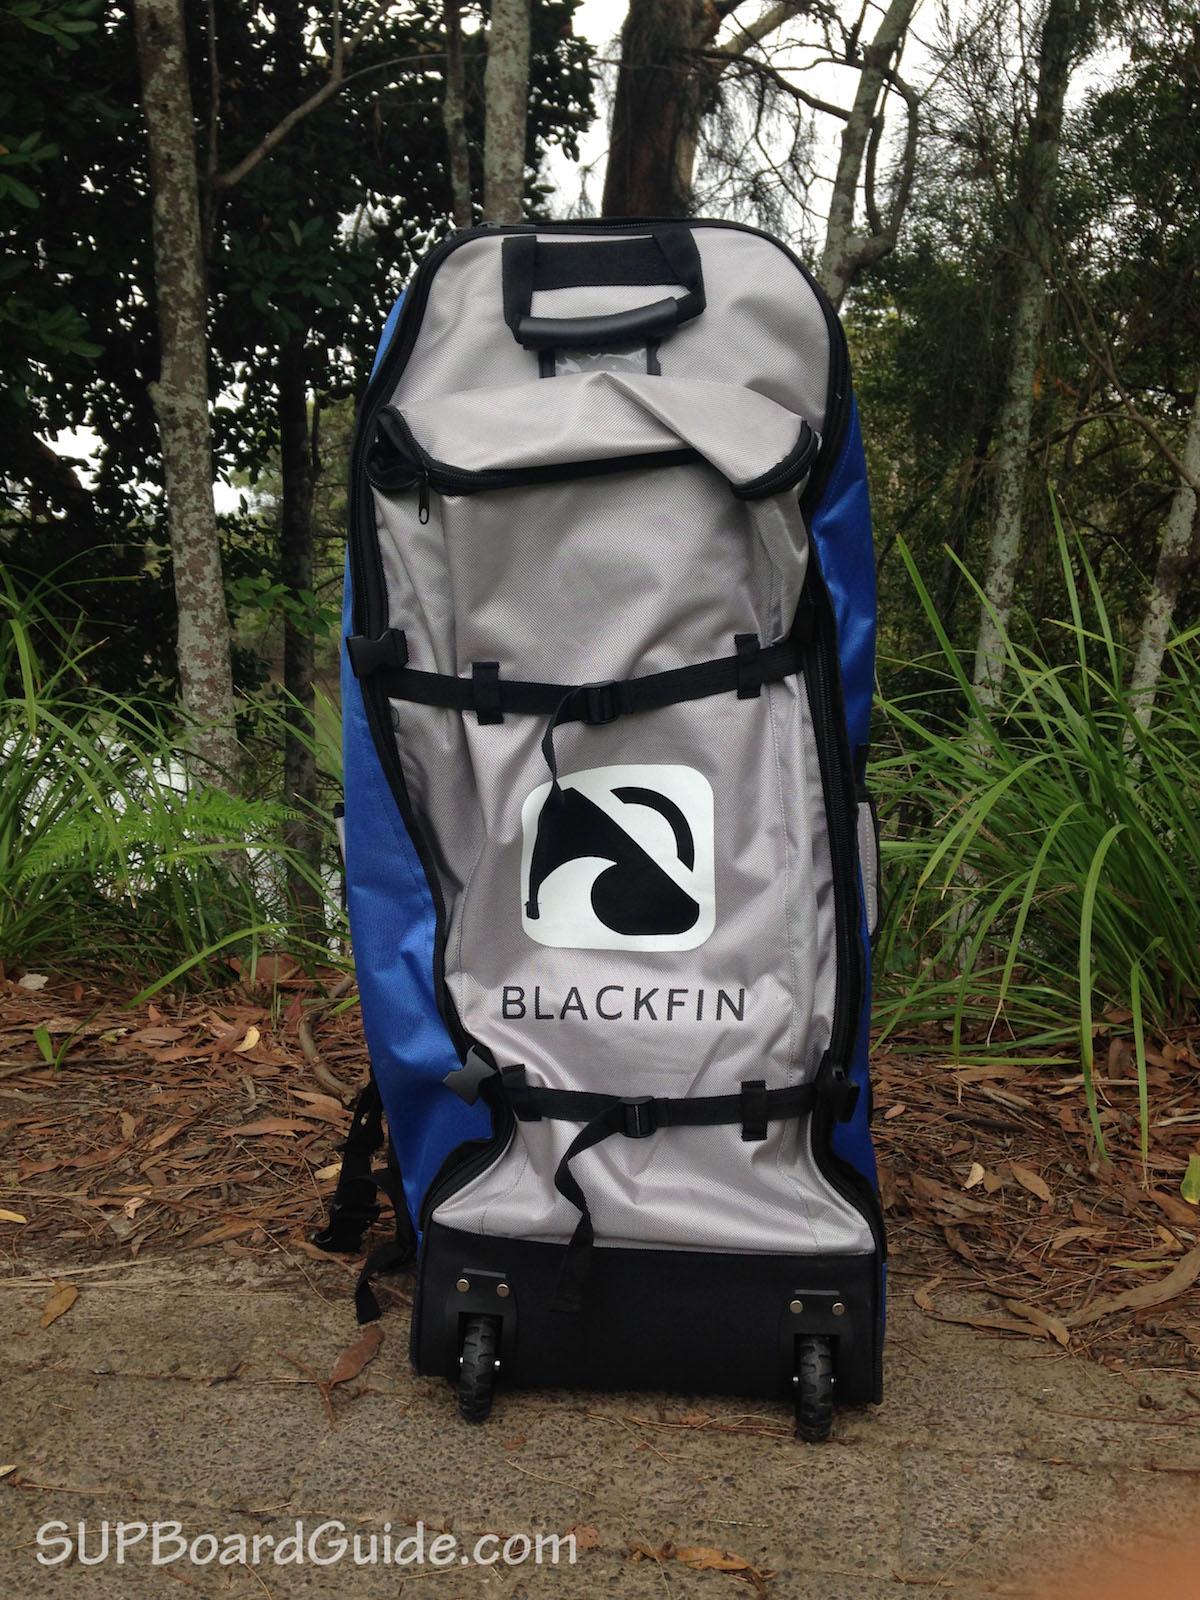 New Blackfin Backpack